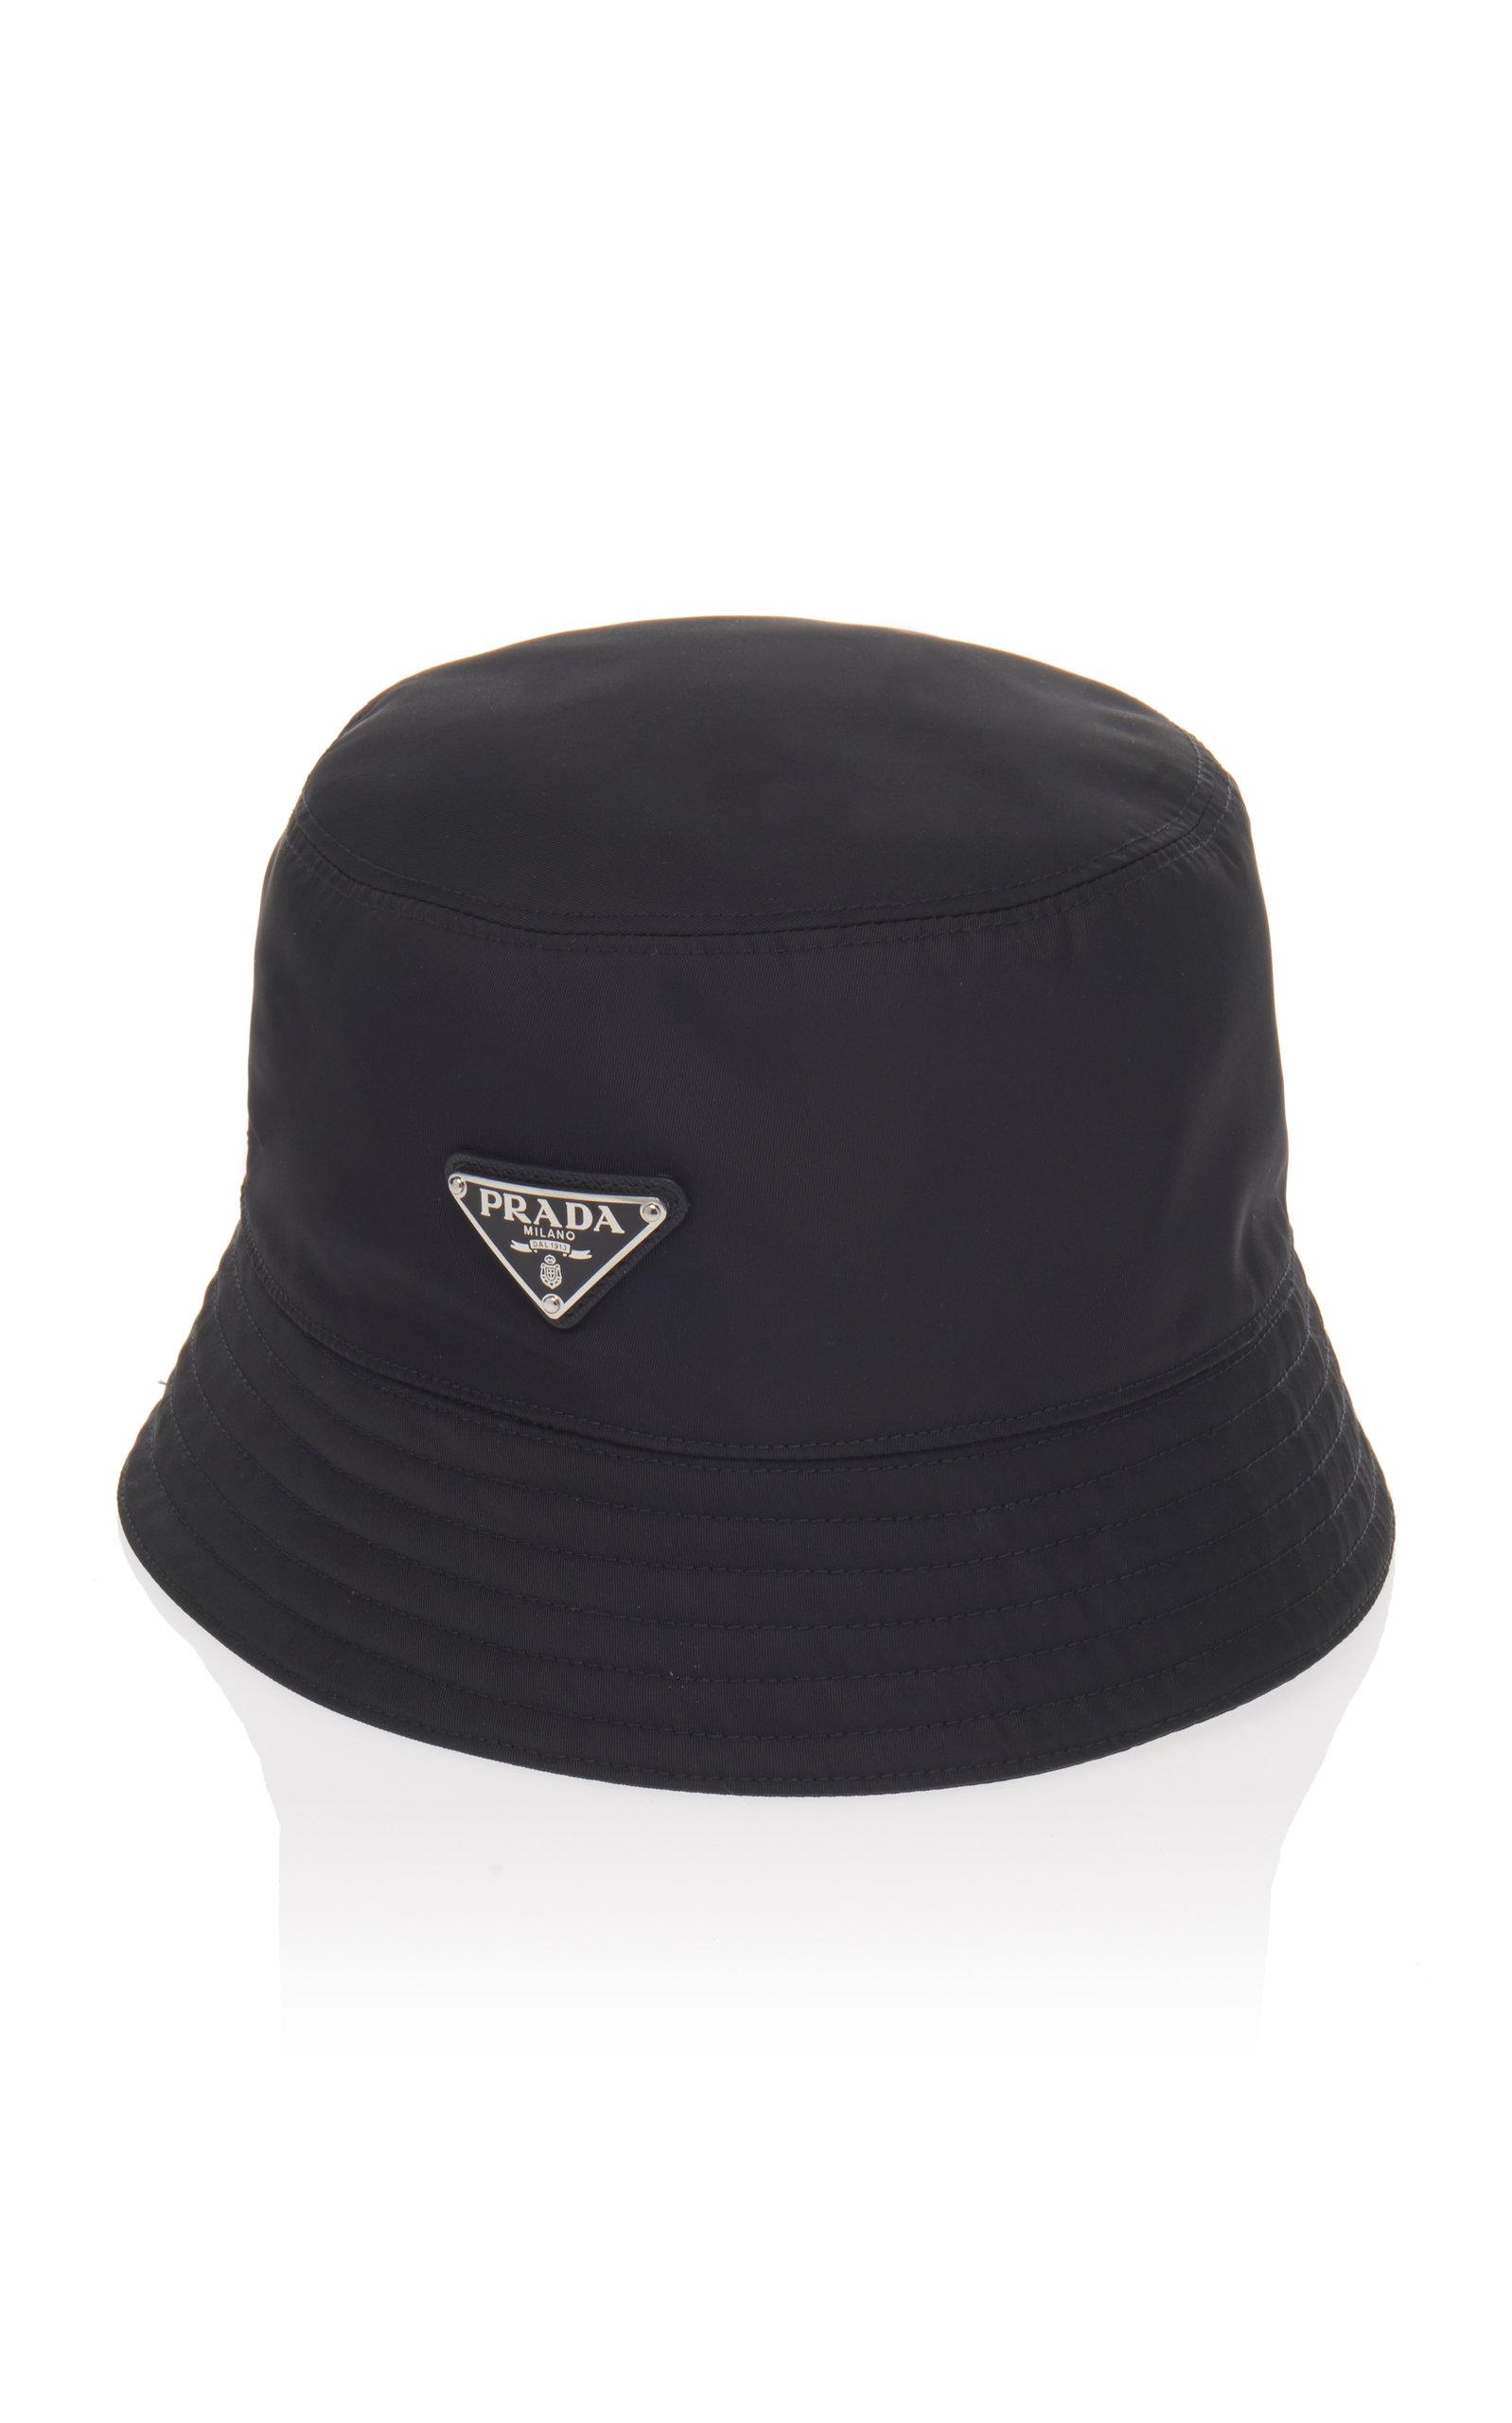 c4fc2996d32ff PradaShell Bucket Hat. CLOSE. Loading